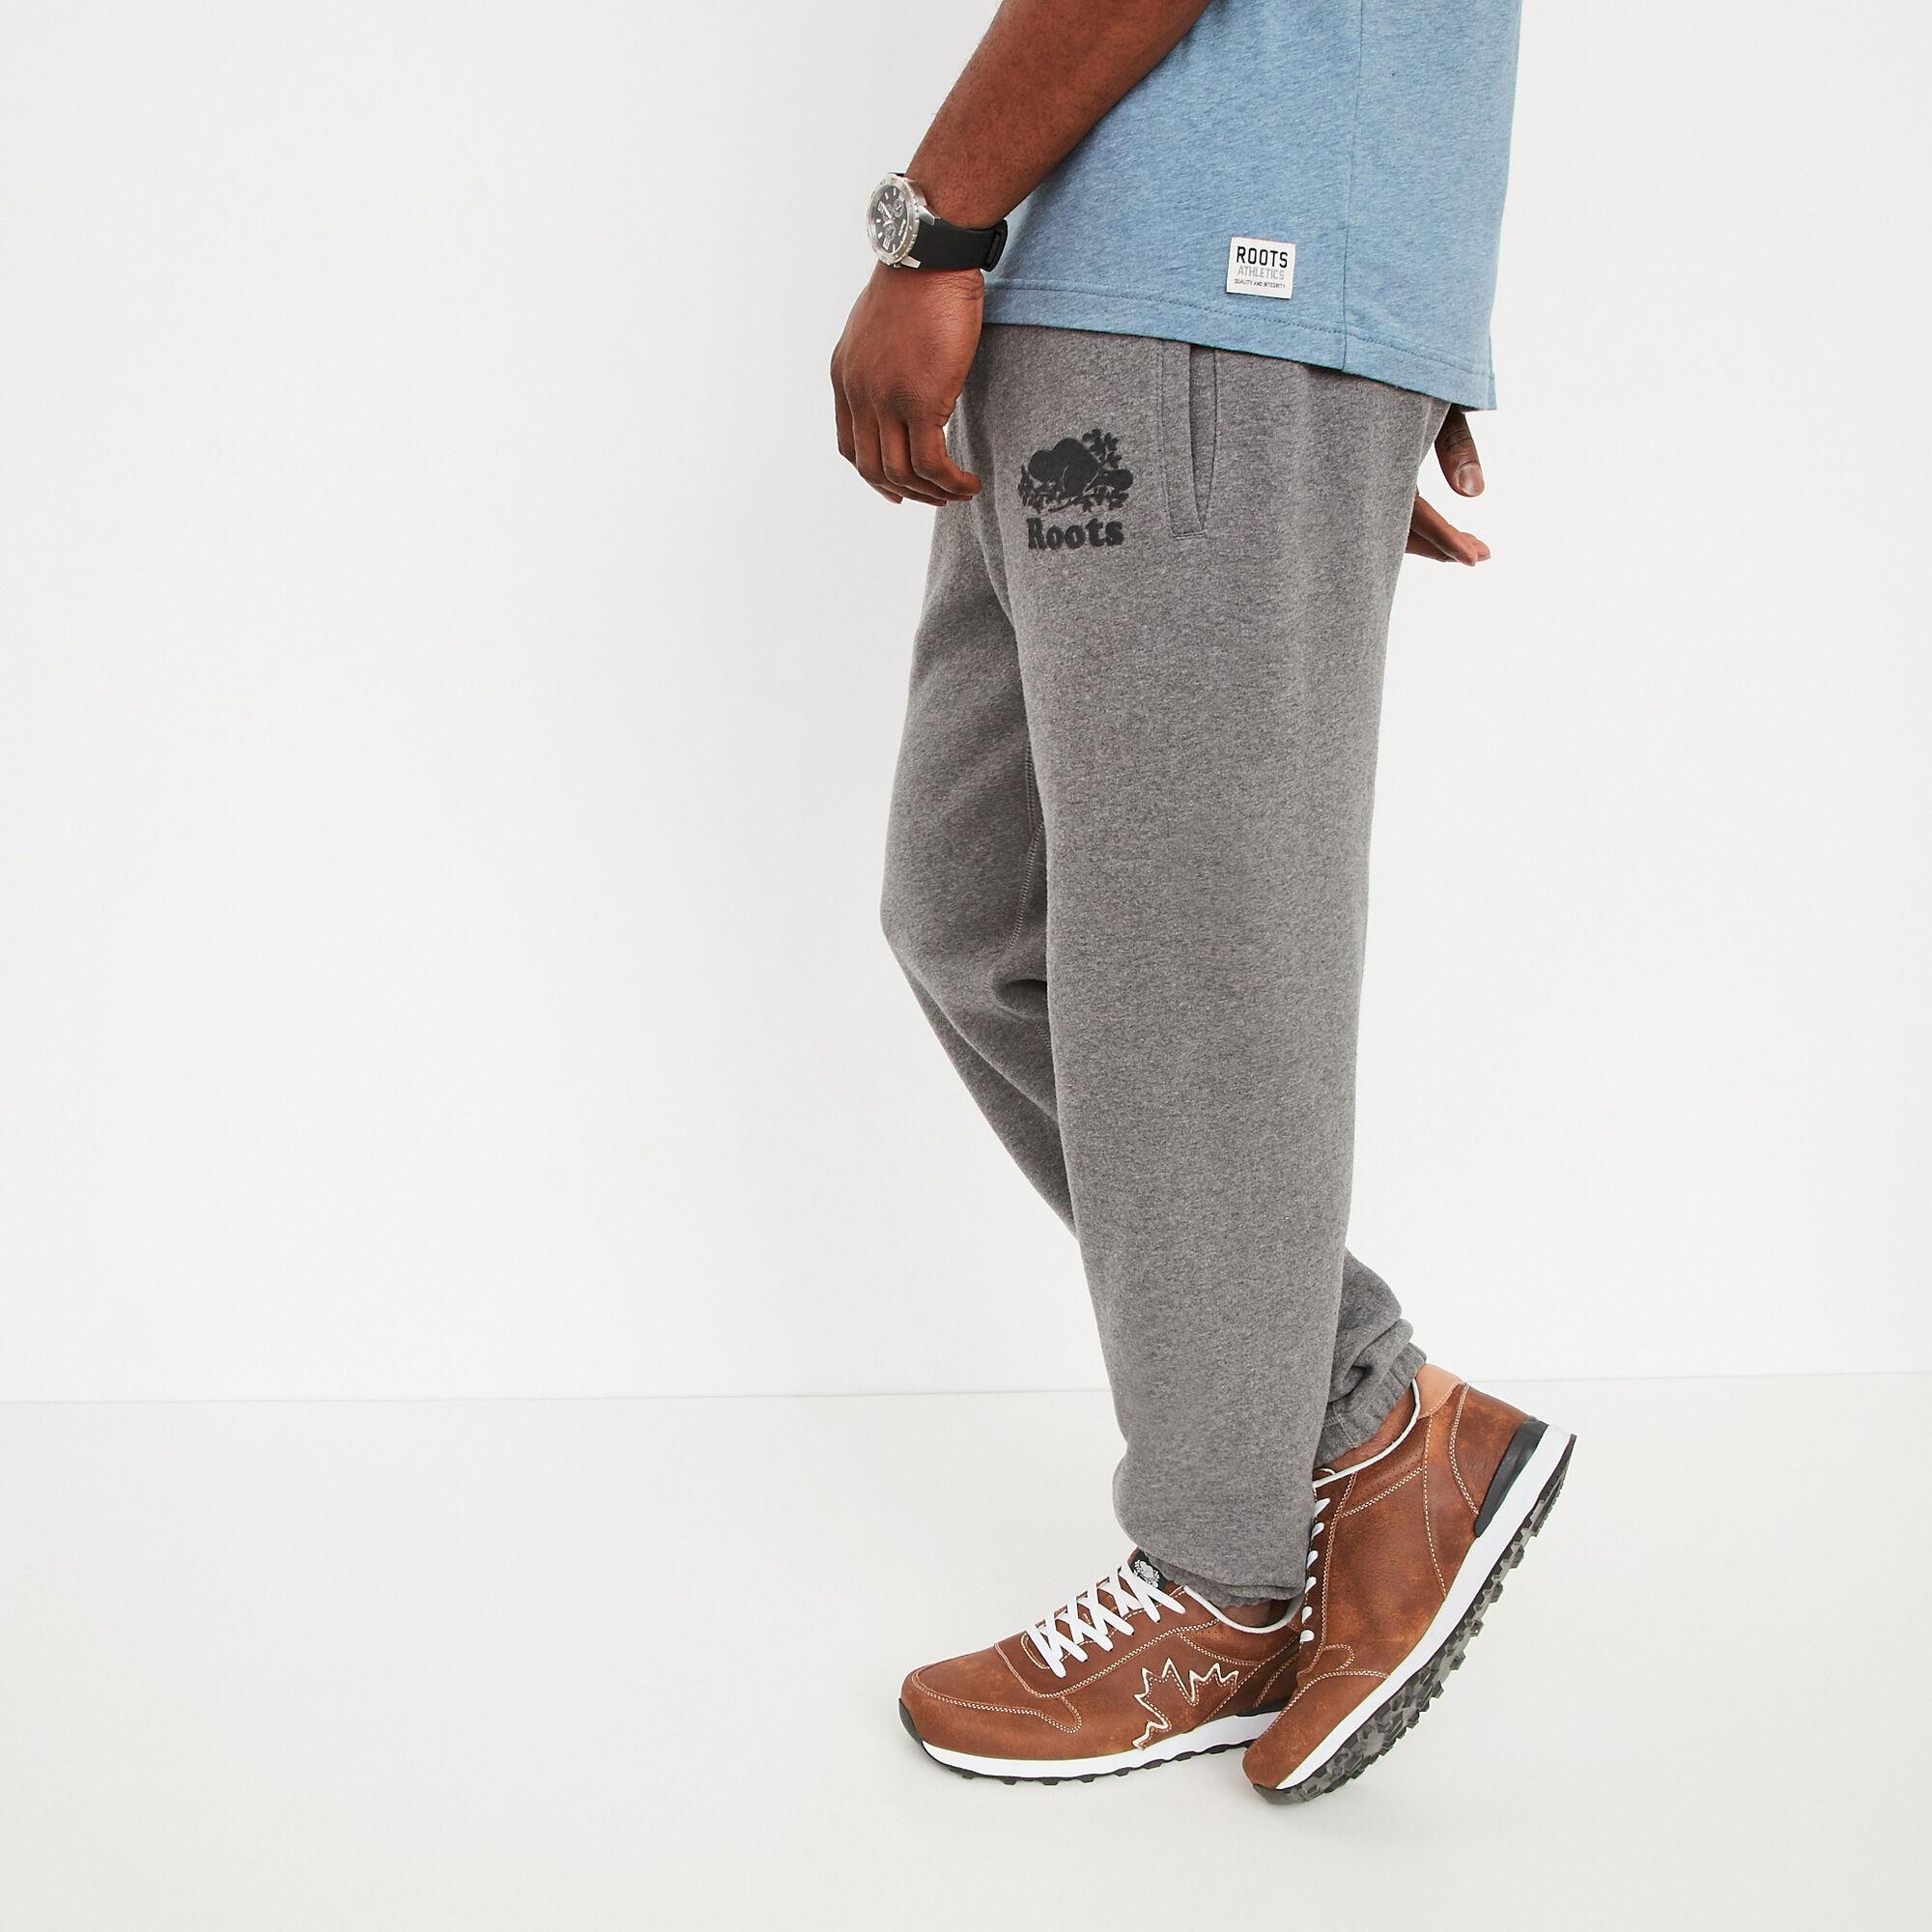 Pantalon Cot Ouaté Original